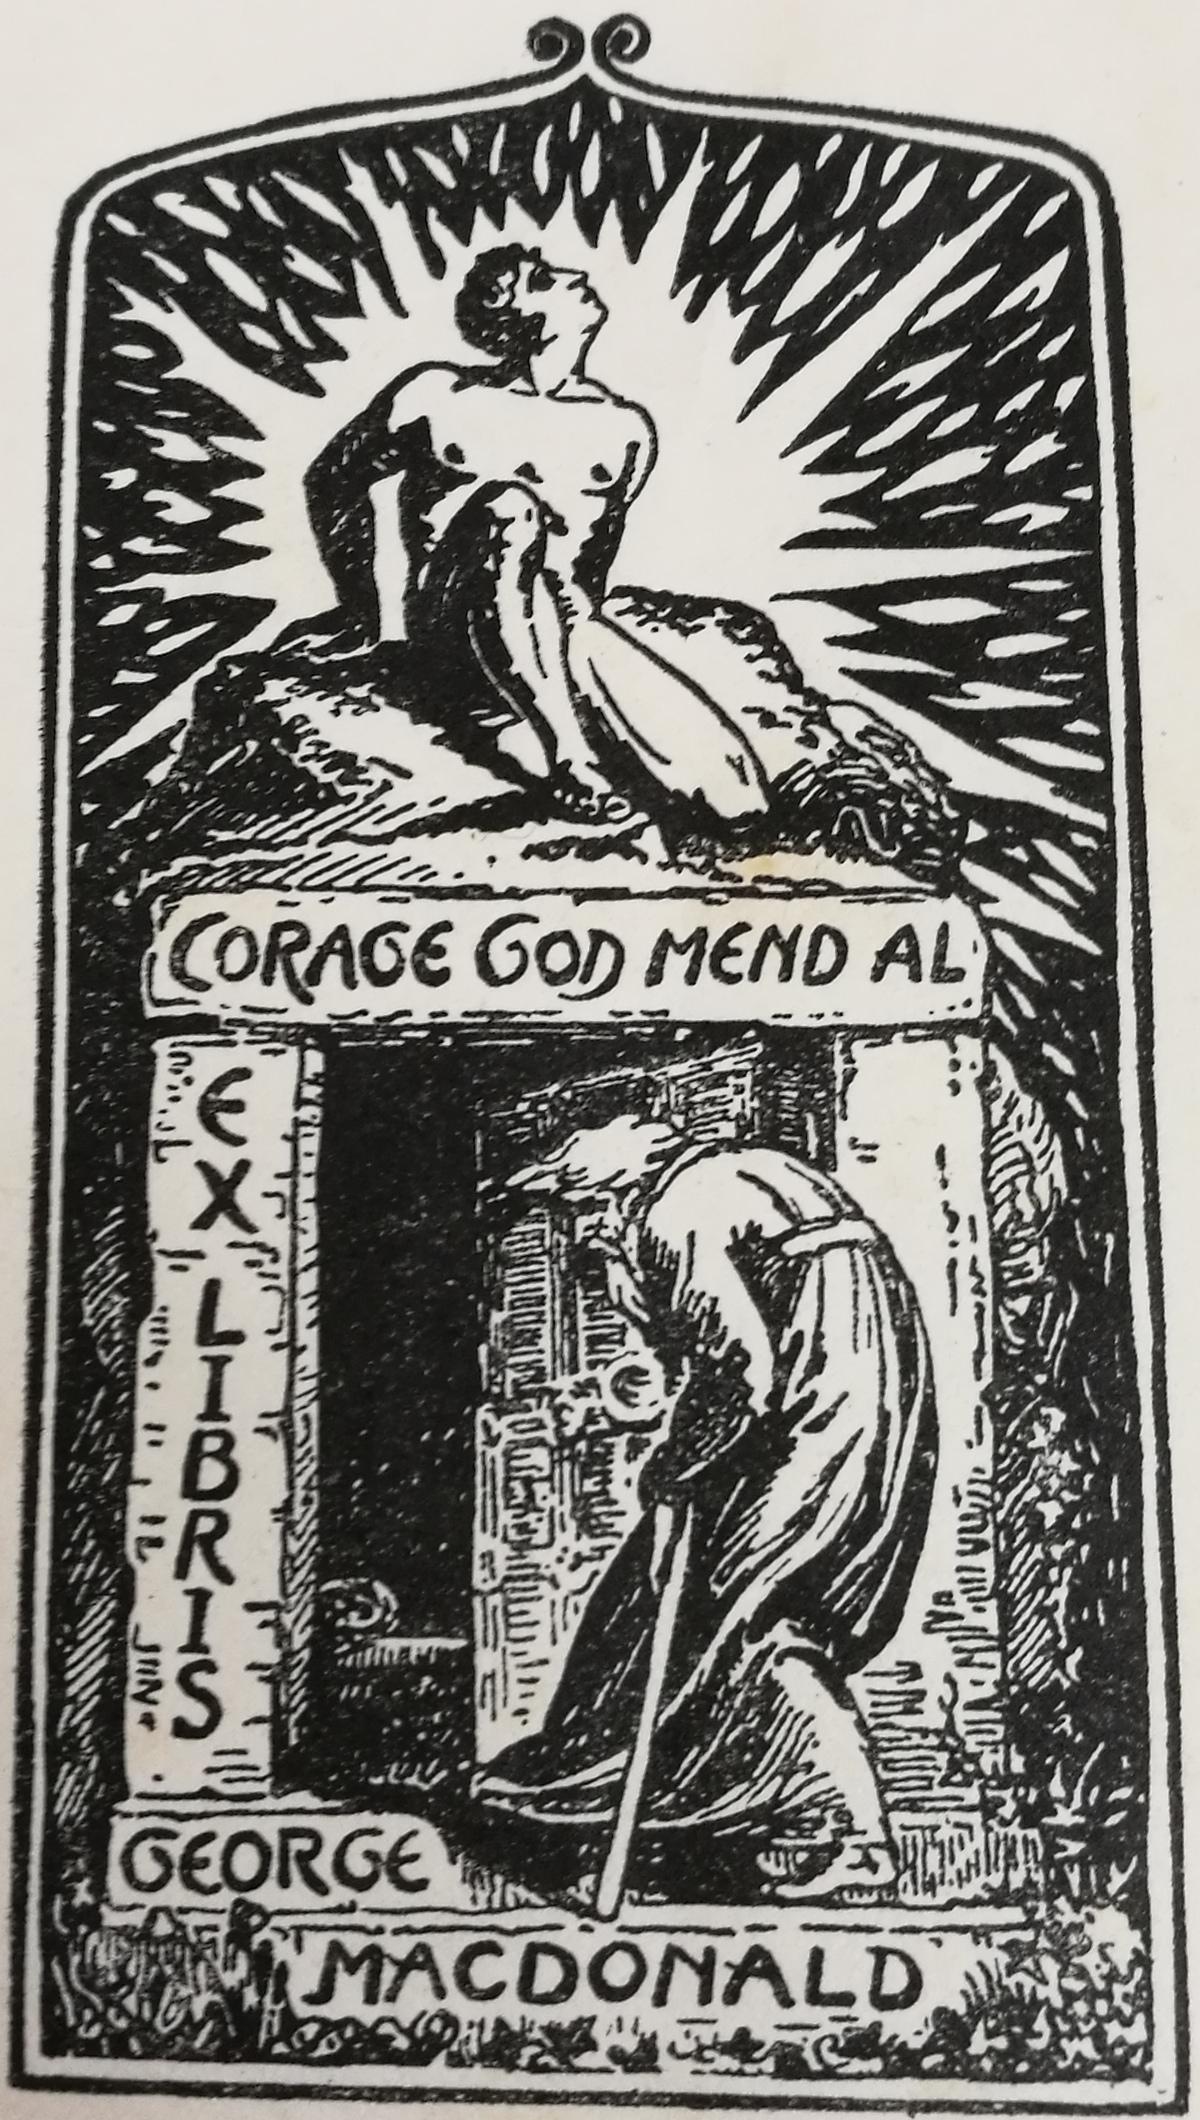 God_mend_all